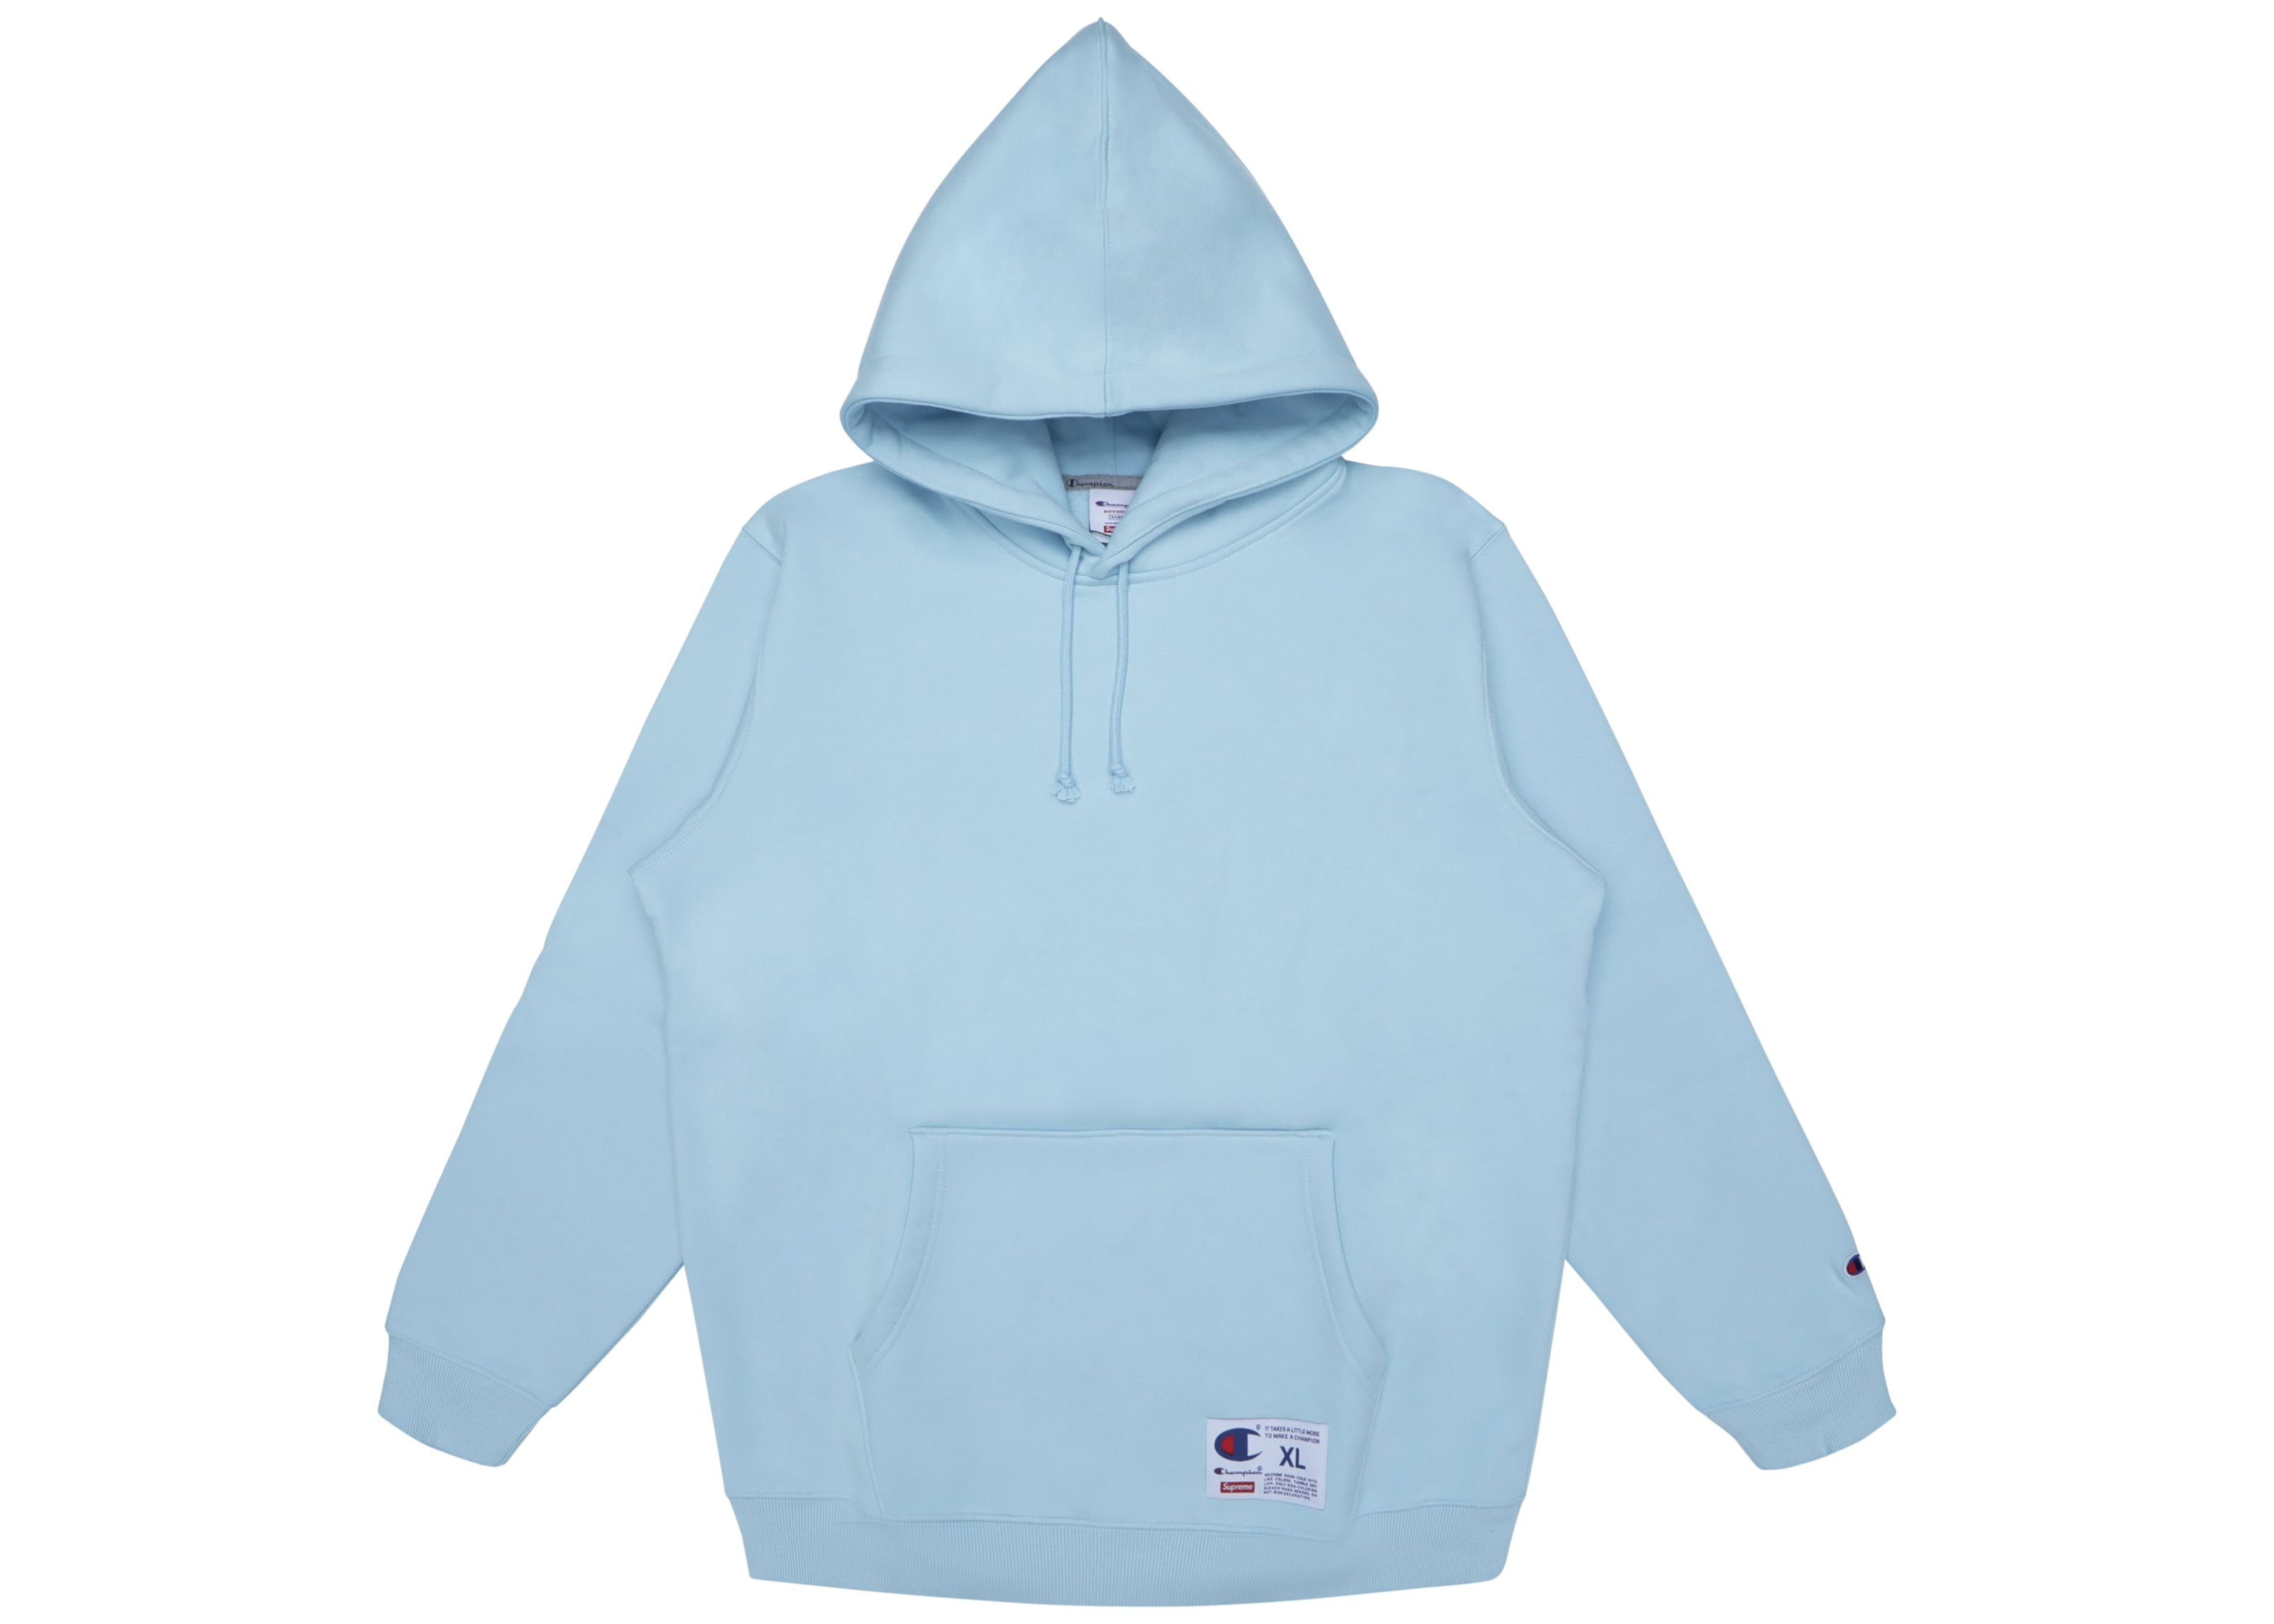 Supreme Champion Hooded Sweatshirt Ss18 Light Blue Supreme Cloth Champion Hooded Sweatshirt Hooded Sweatshirts Blue Champion Sweatshirt [ 2298 x 3217 Pixel ]